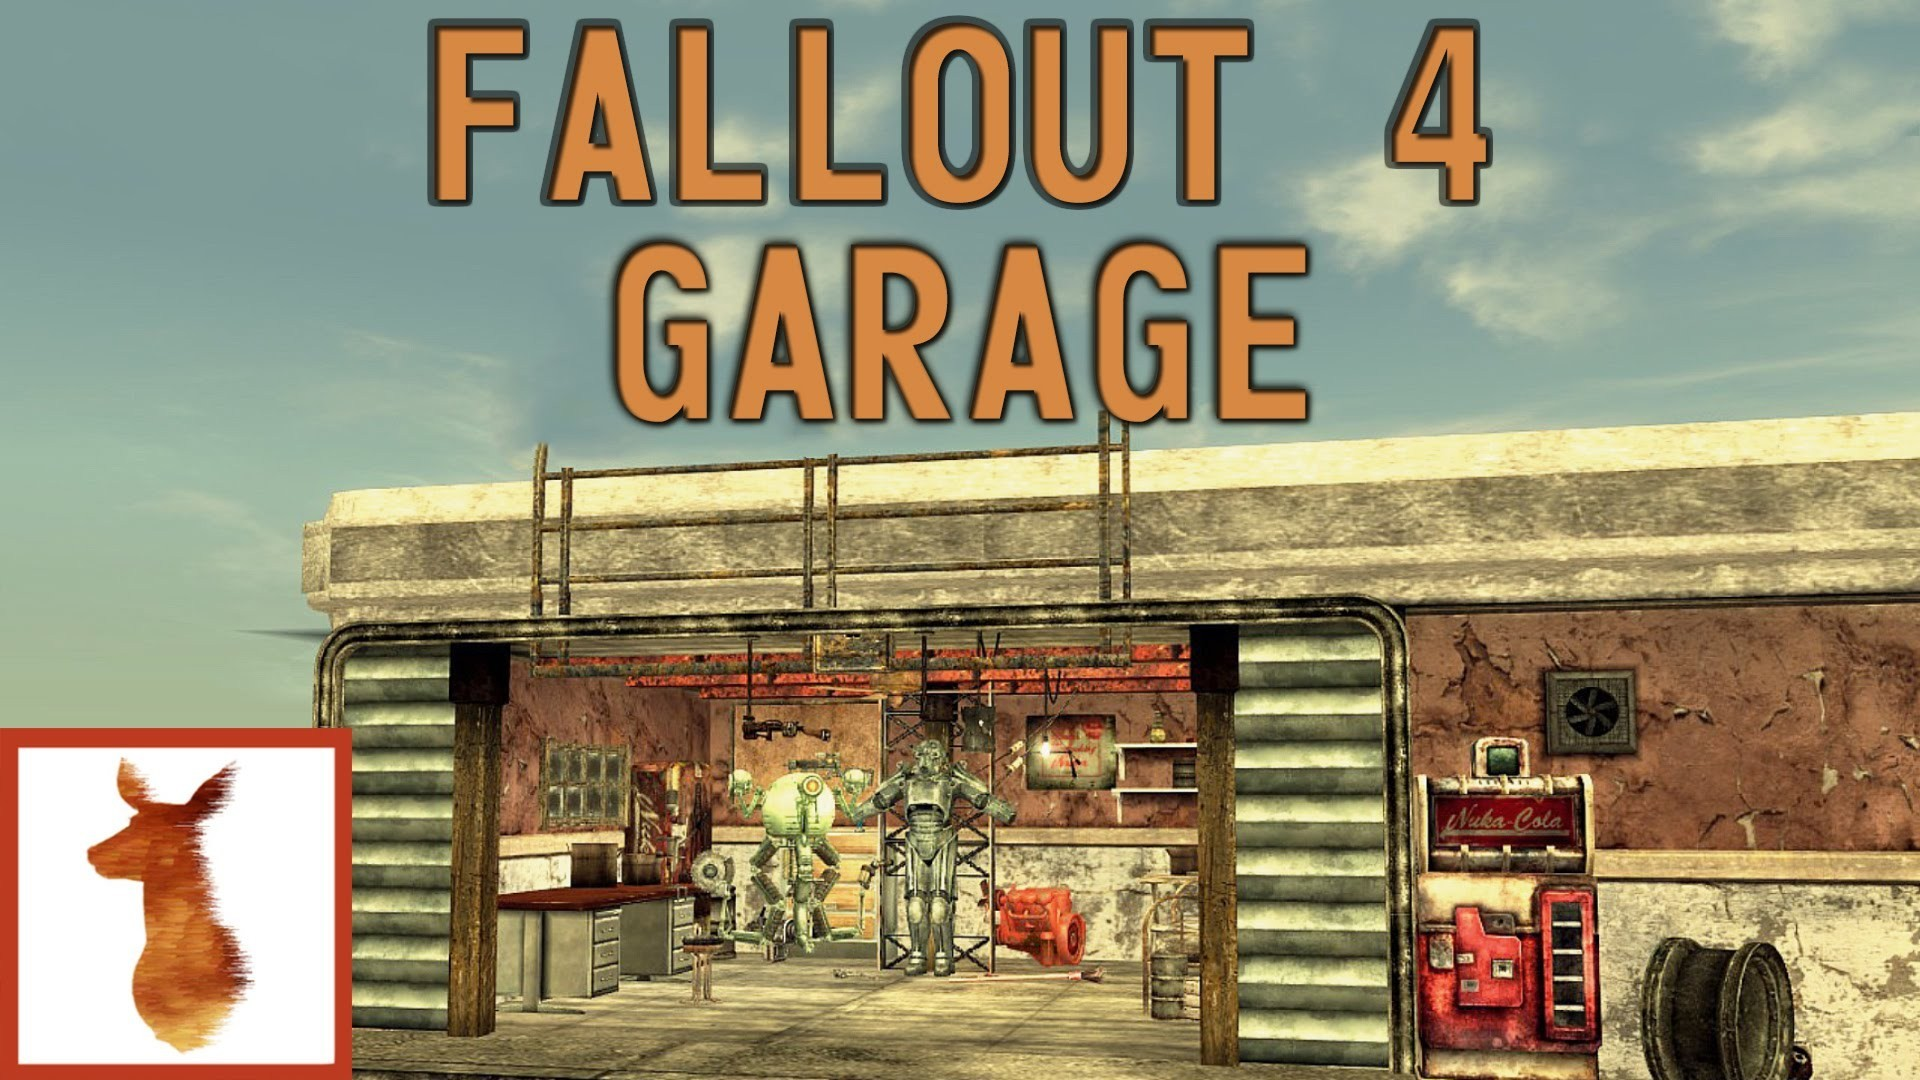 fallout 4 garage wallpaper 4